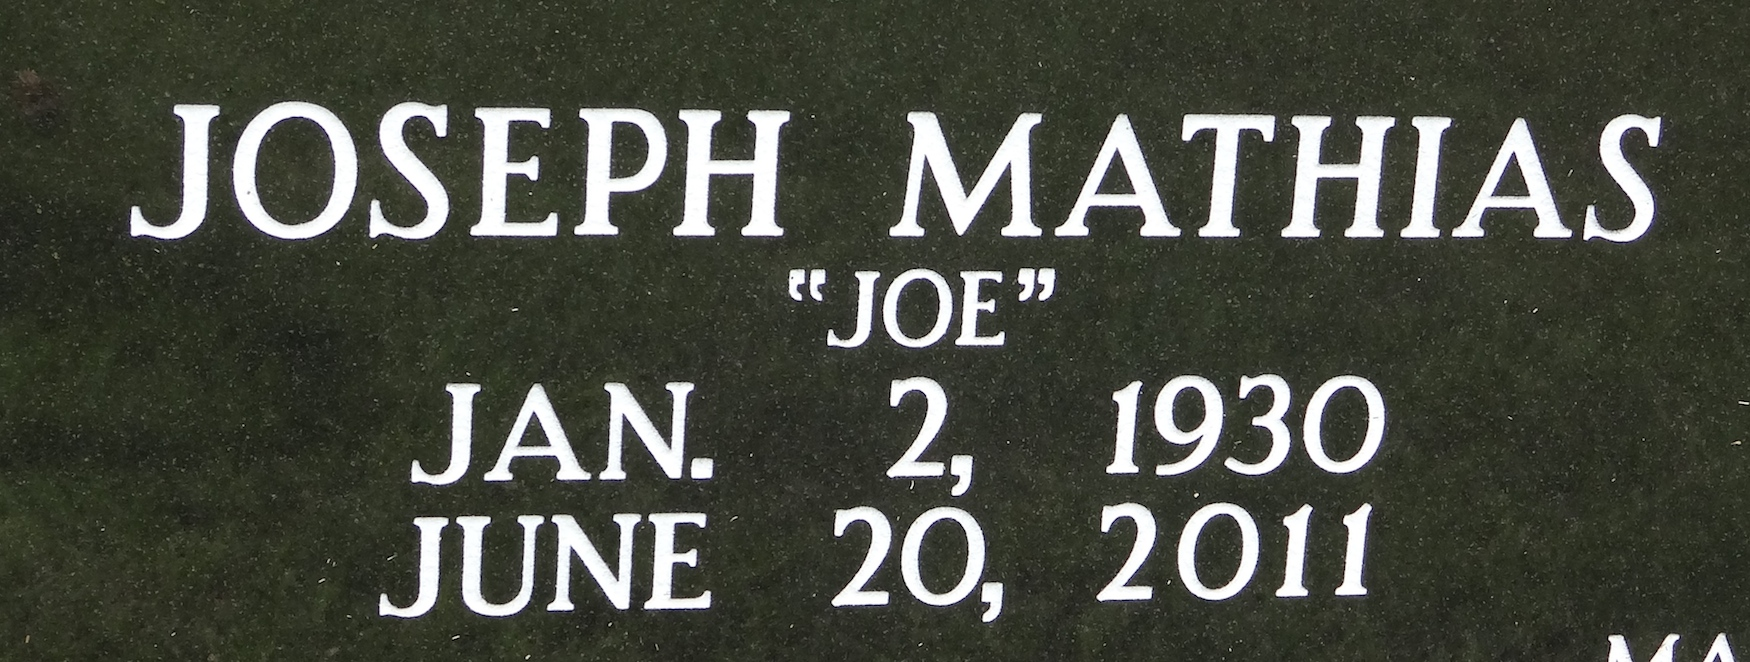 Joseph Mathias Joe Hickel